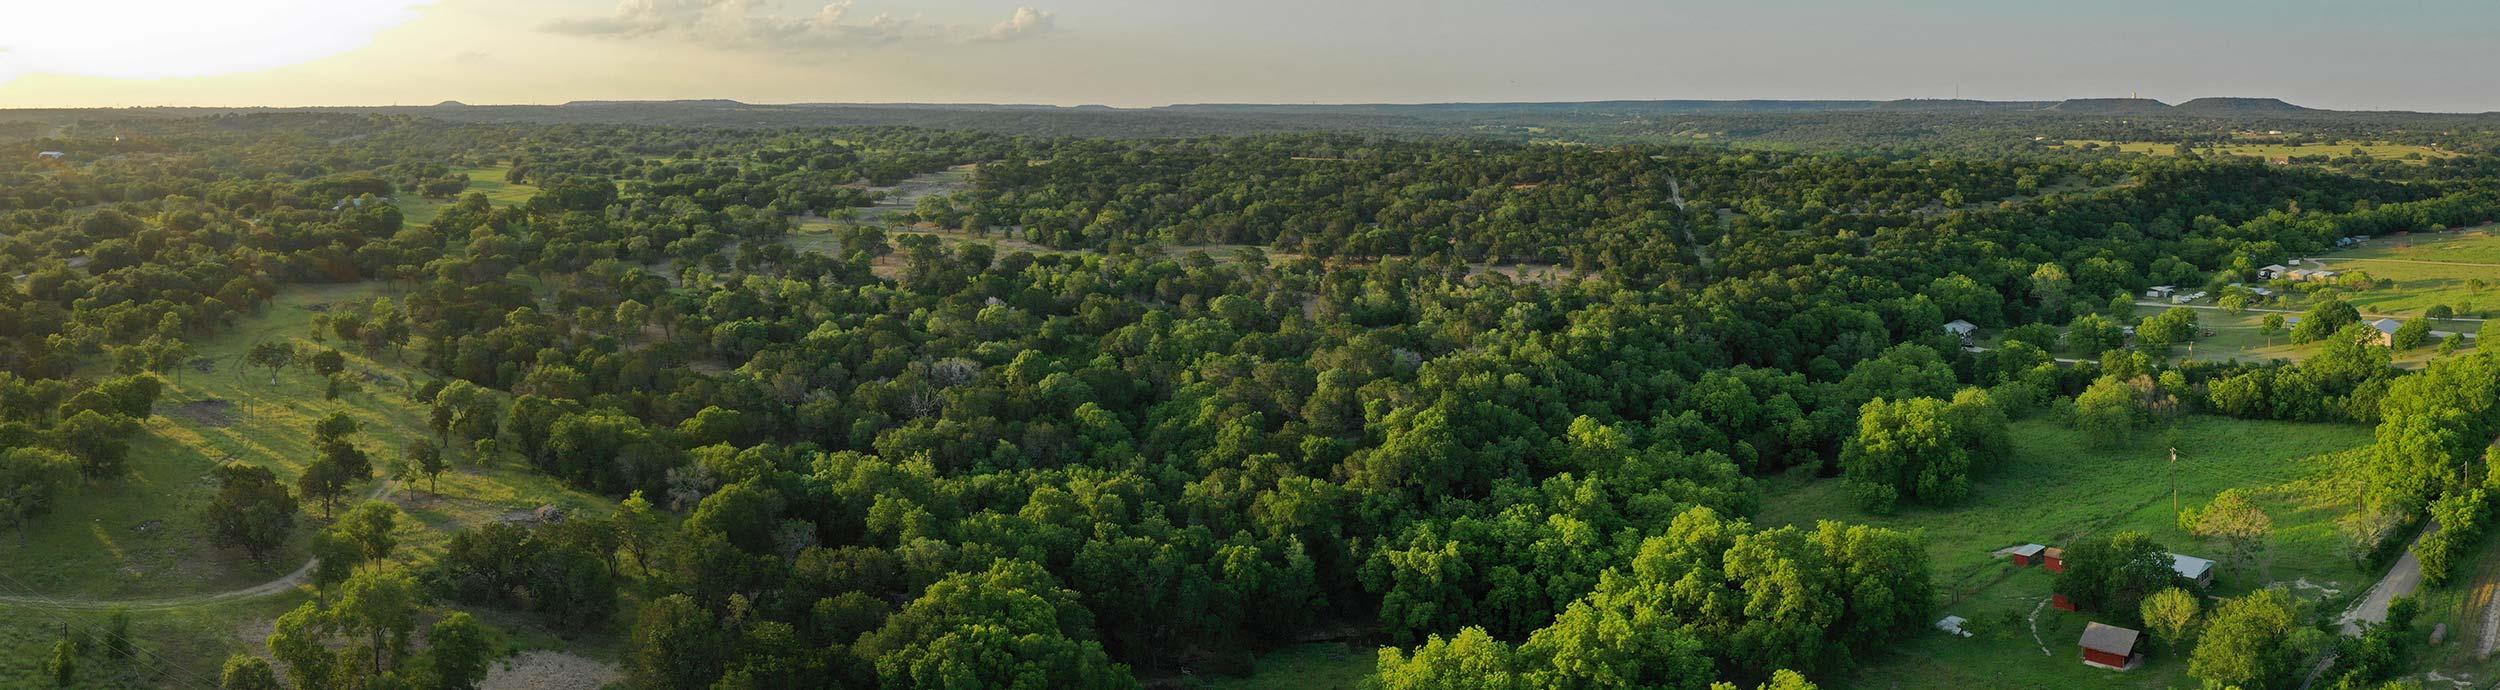 Texas Land for Sale - National Land Partners - Arrowhead